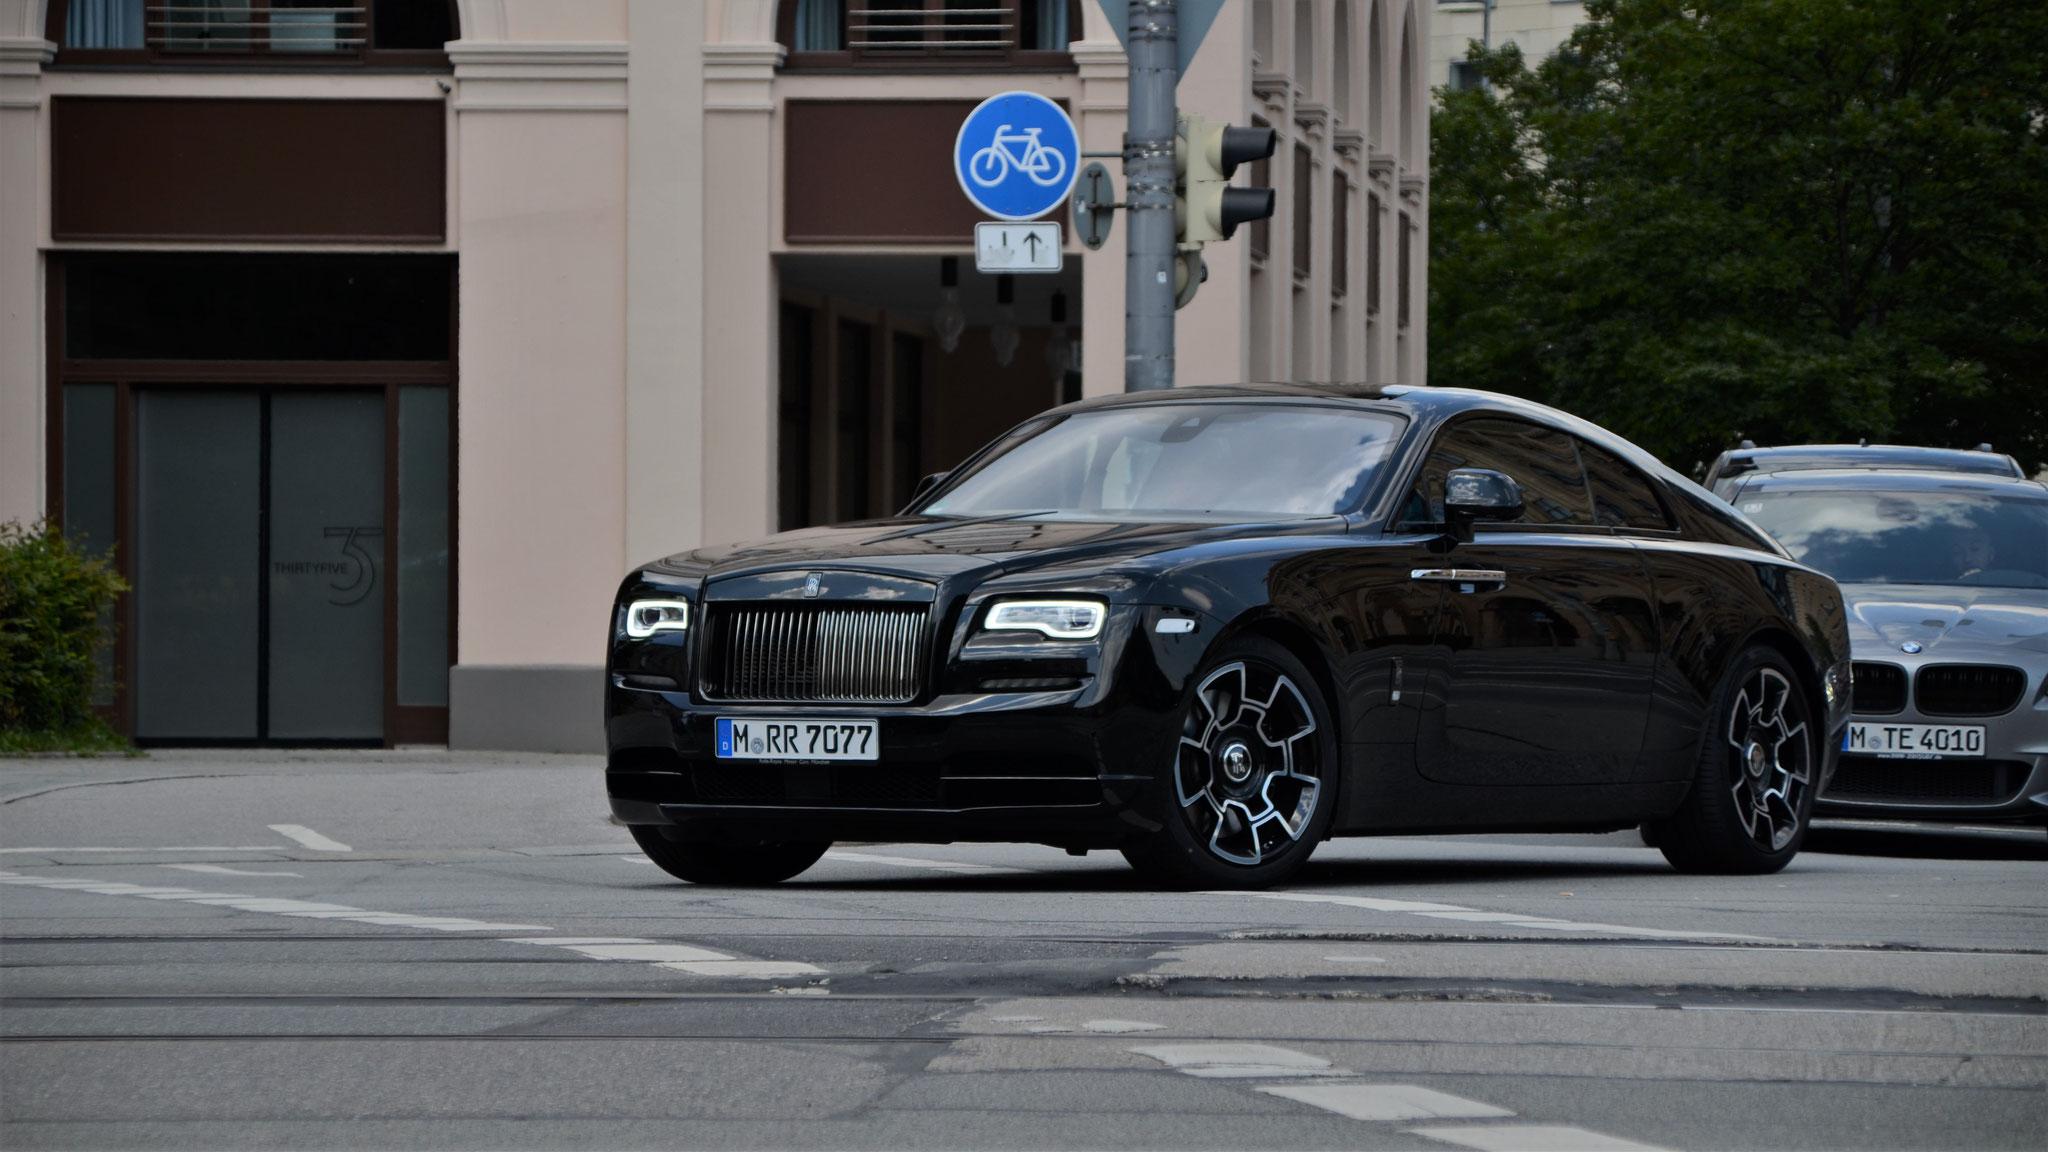 Rolls Royce Wraith Black Badge - M-RR-7077